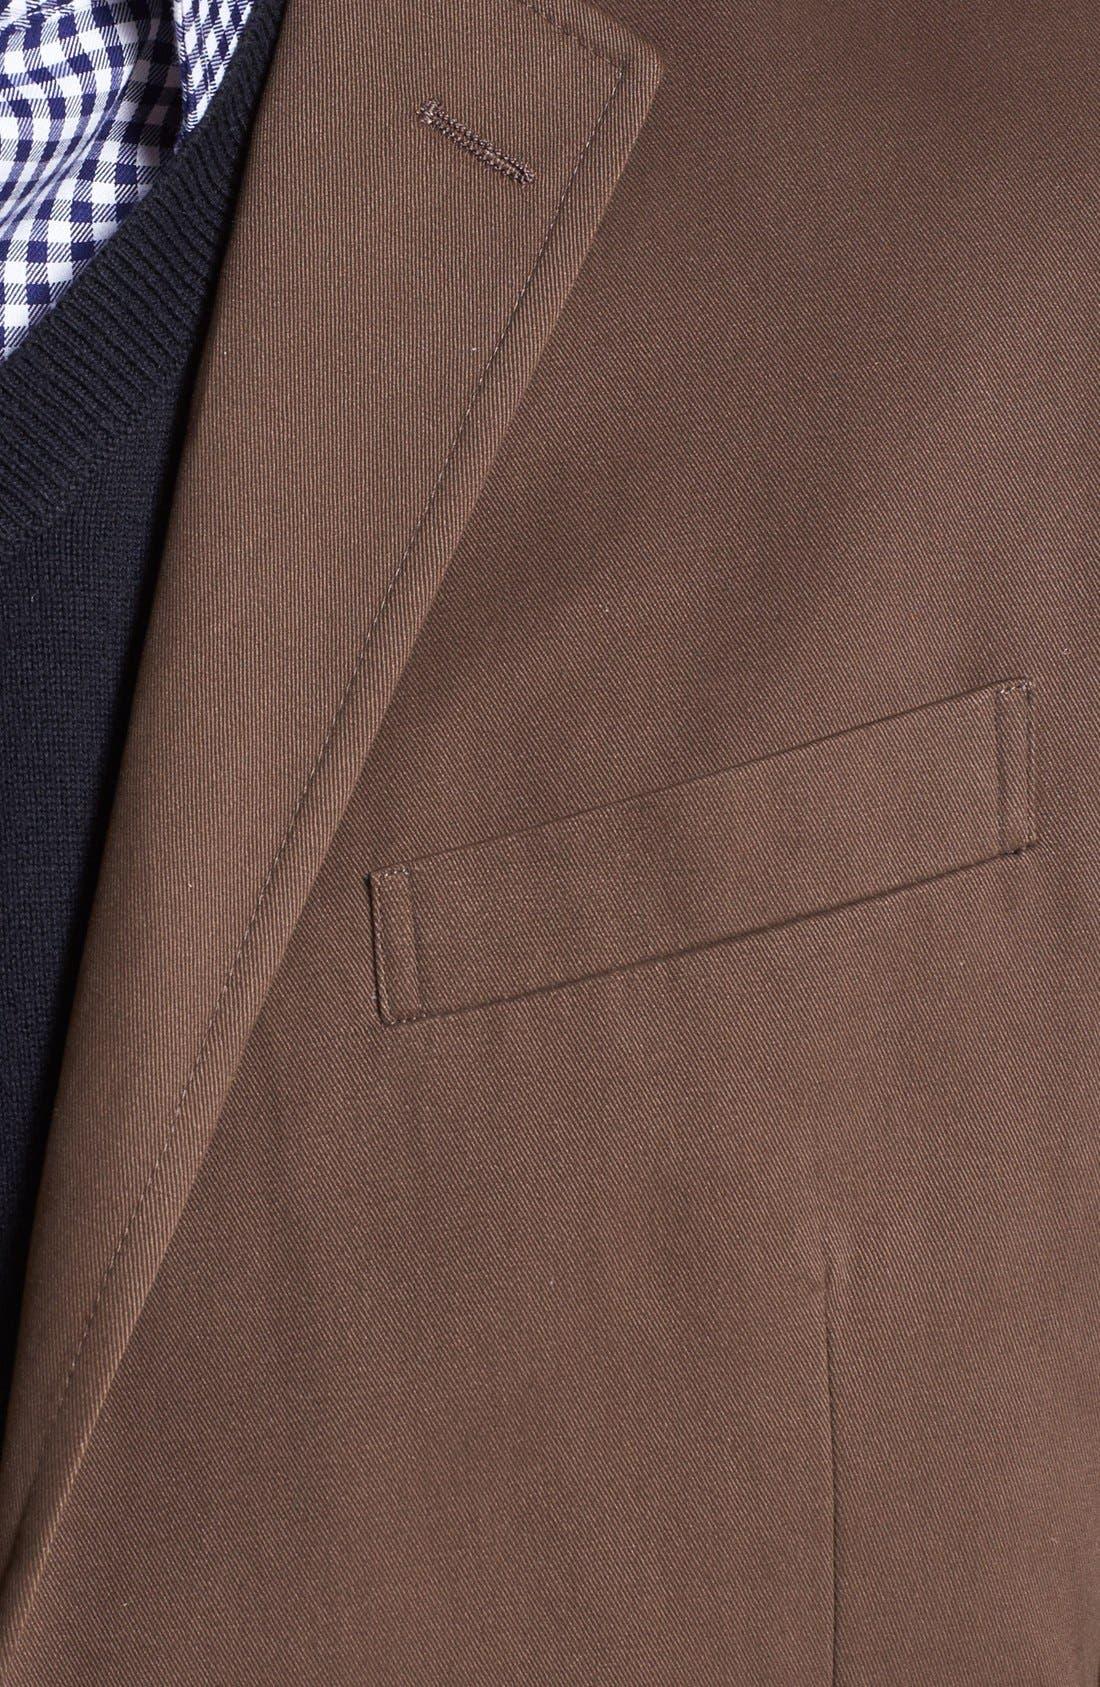 Alternate Image 2  - Wallin & Bros. Extra Trim Fit Cotton Twill Blazer